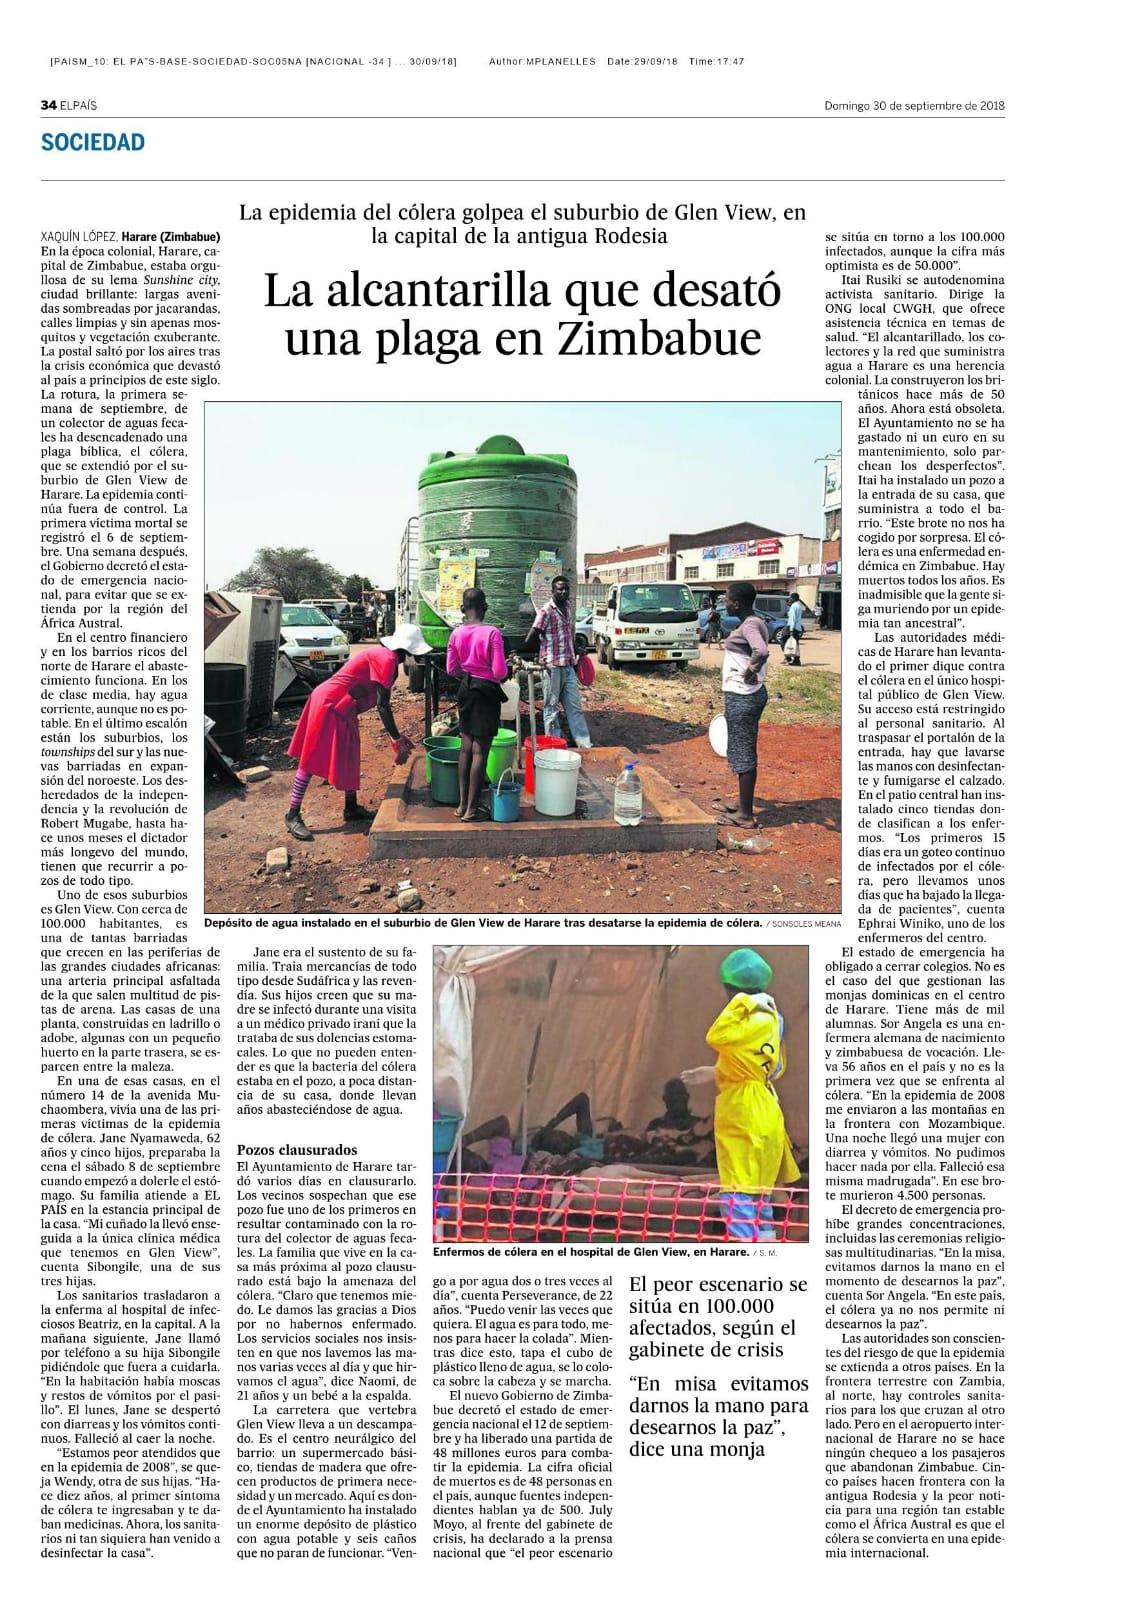 Reportaje de El País